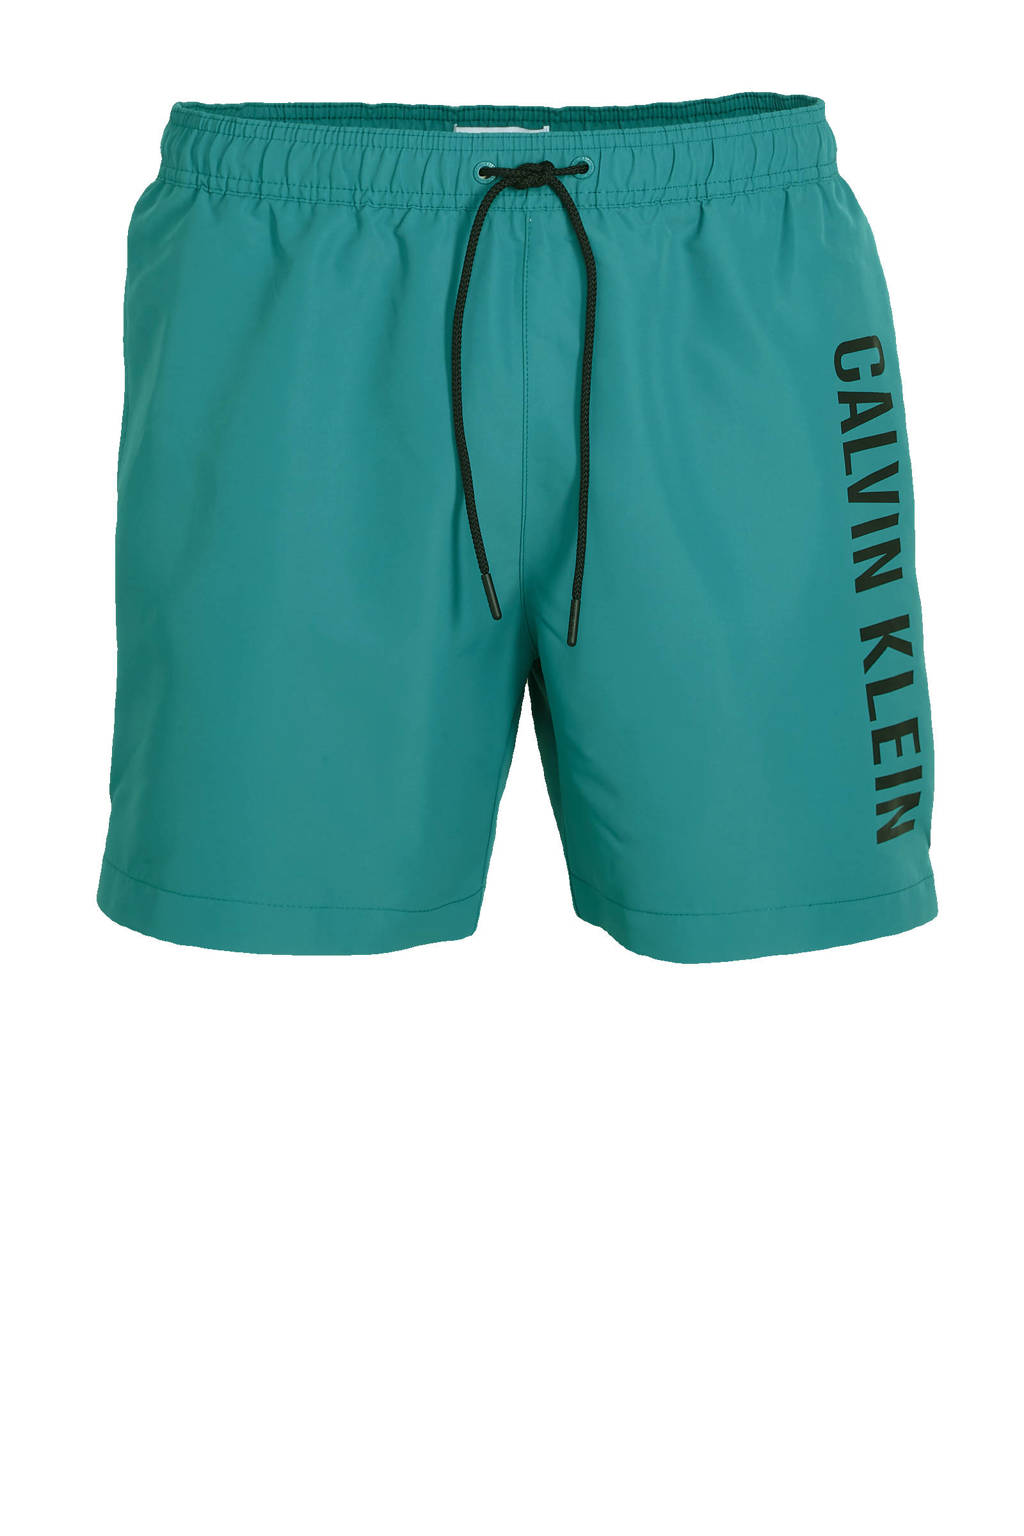 CALVIN KLEIN zwemshort groen, Groen